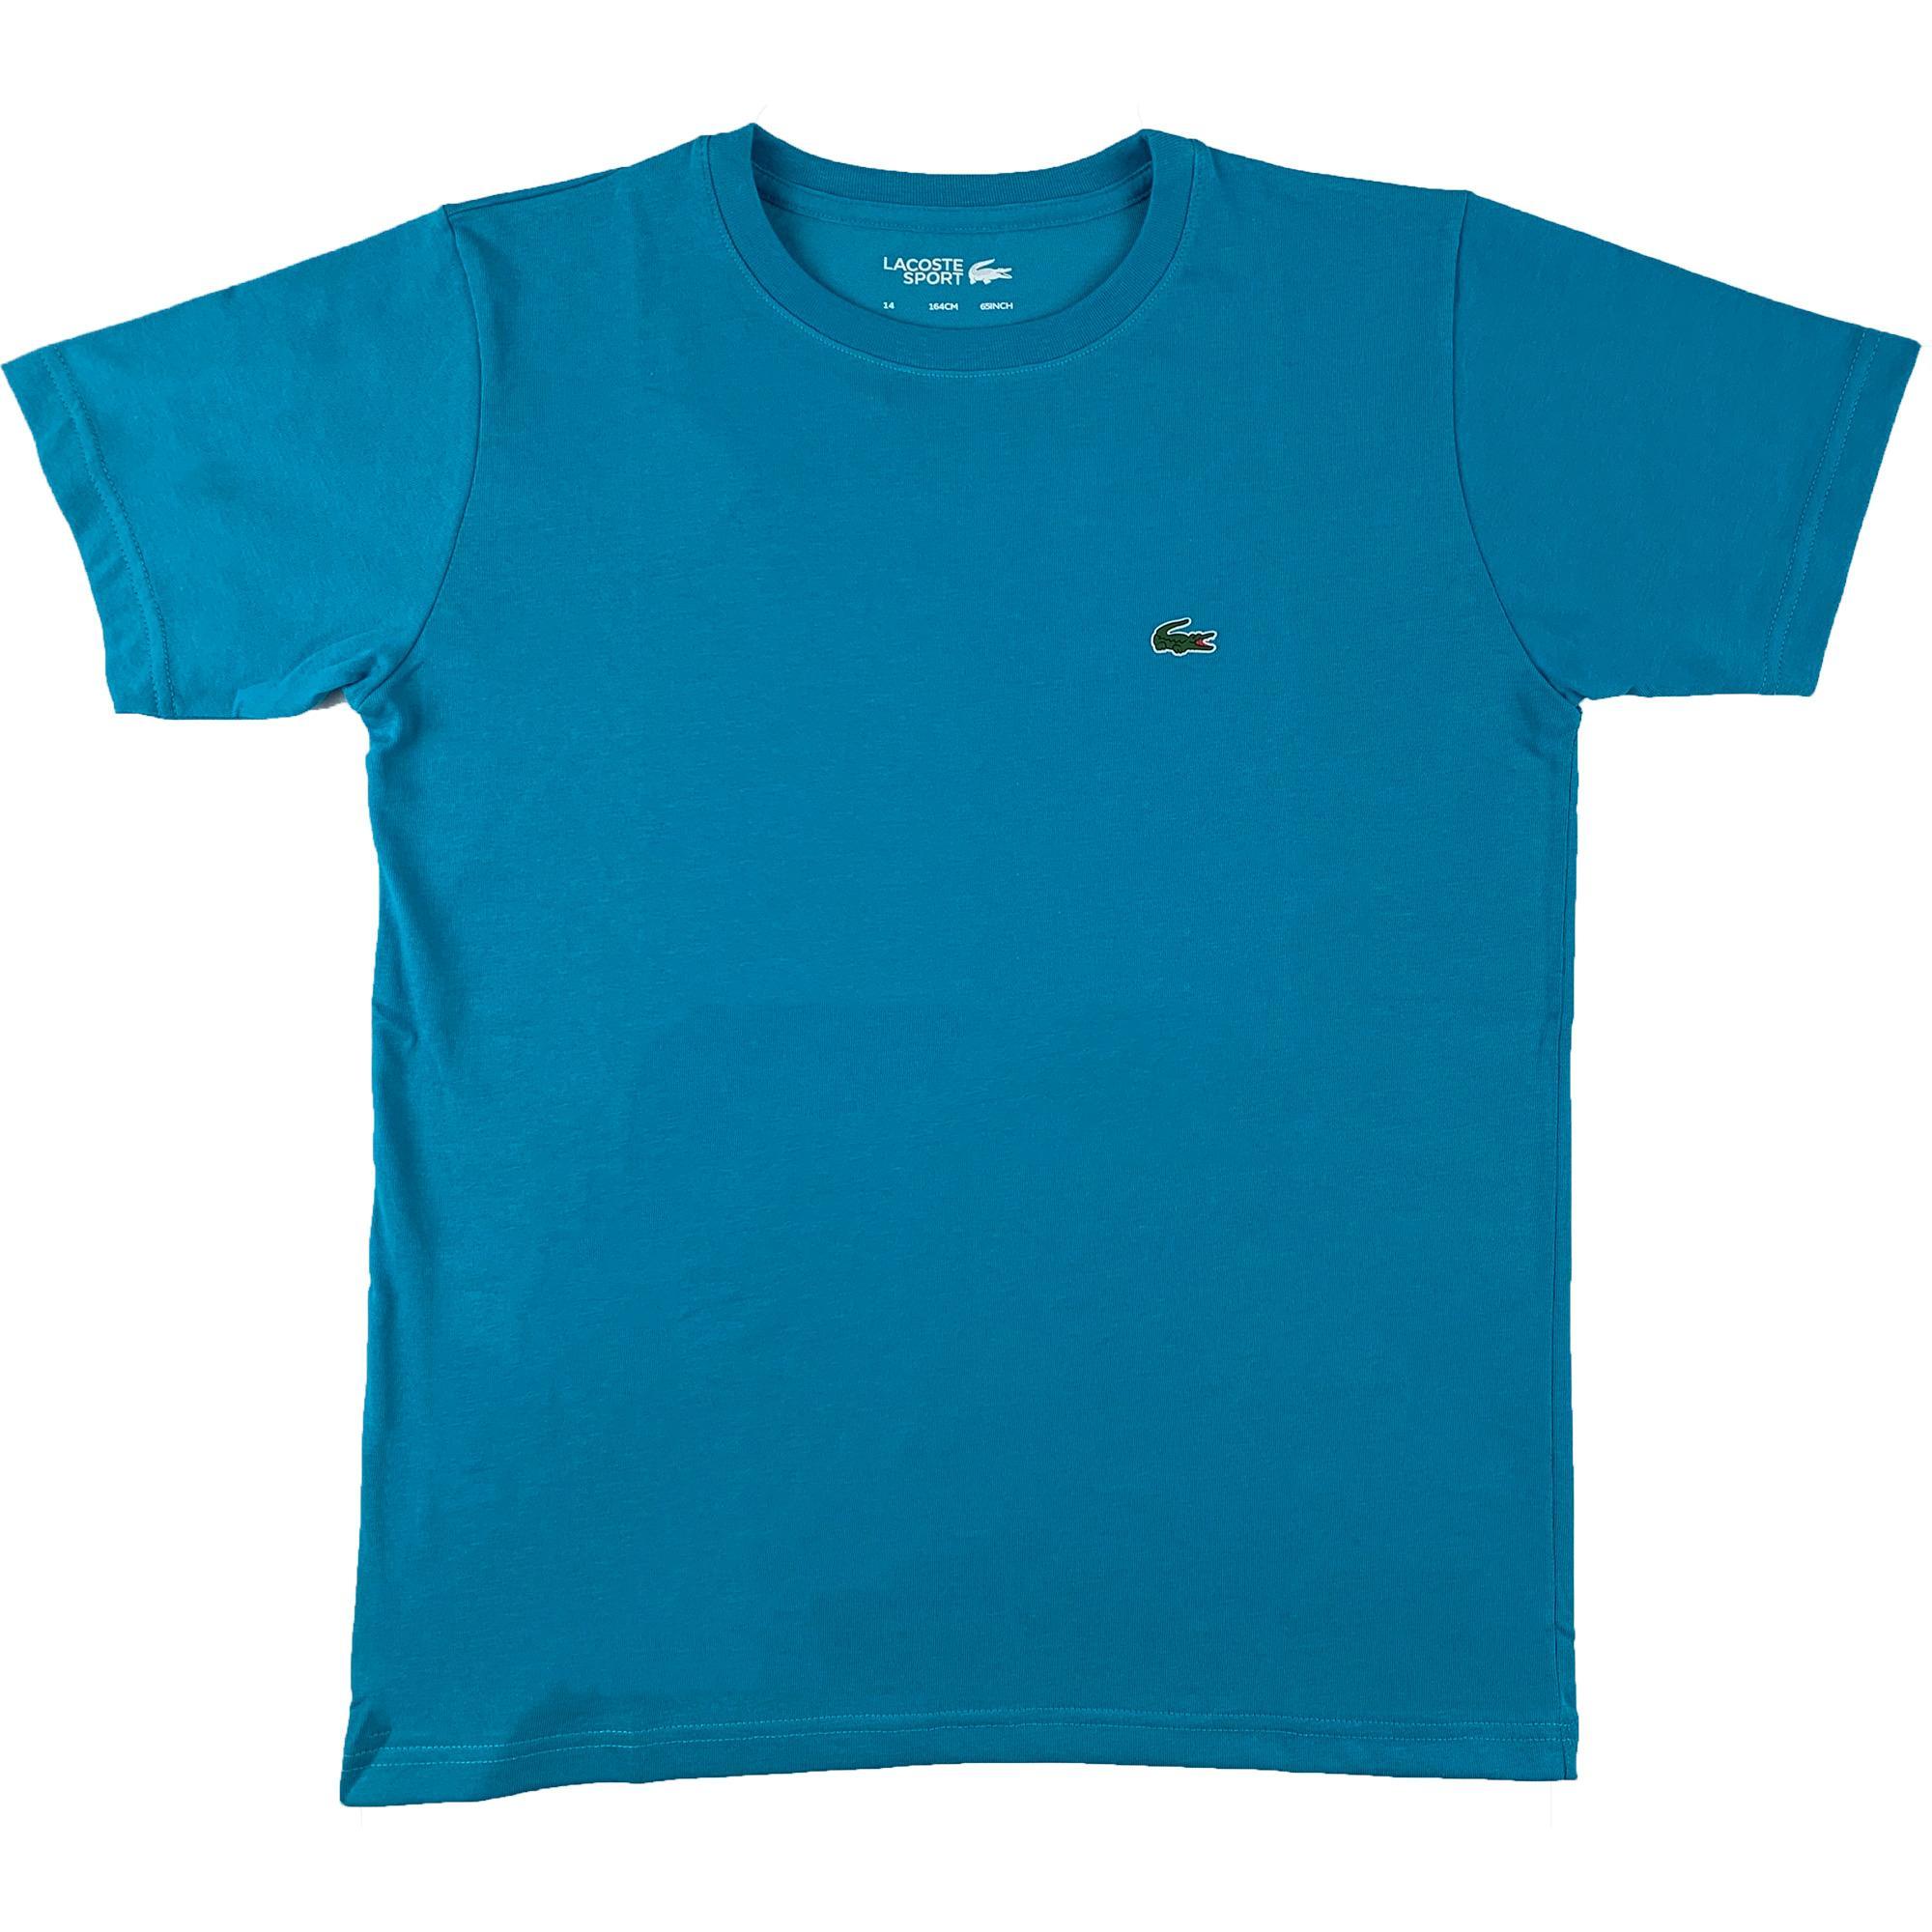 Shirt Lacoste Boys Tj8811 Short Sleeve T